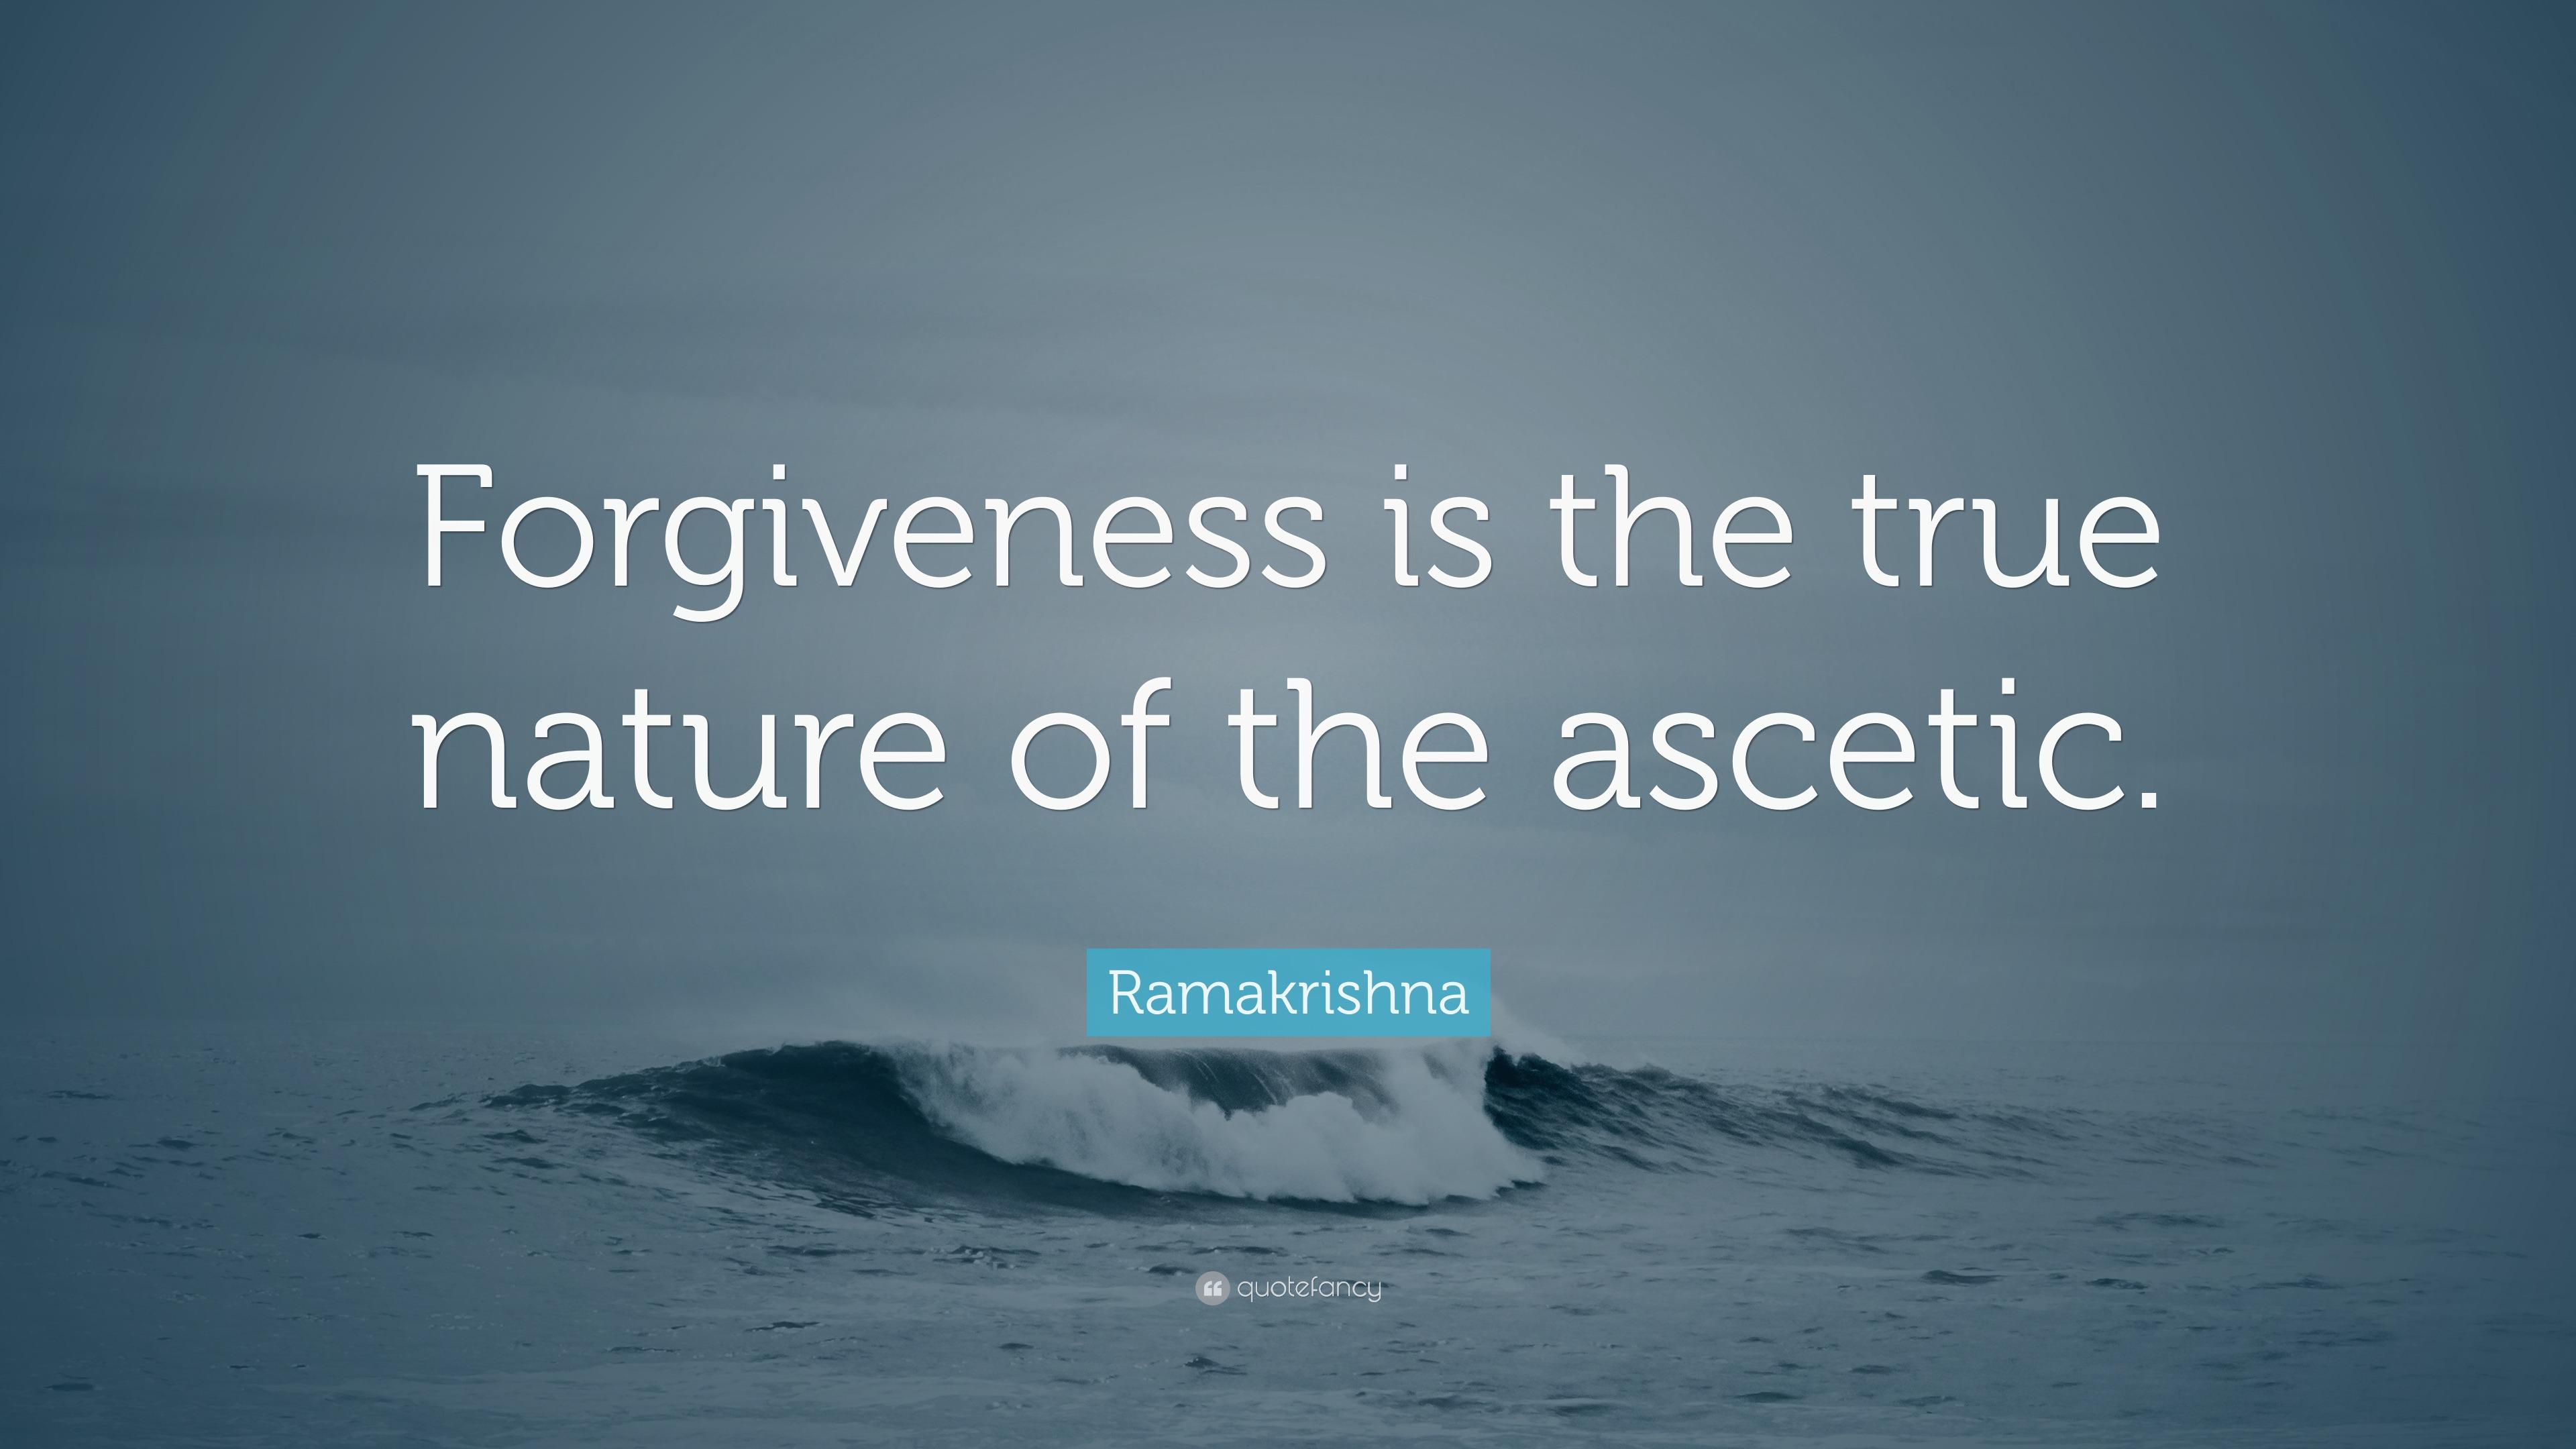 ramakrishna quote   u201cforgiveness is the true nature of the